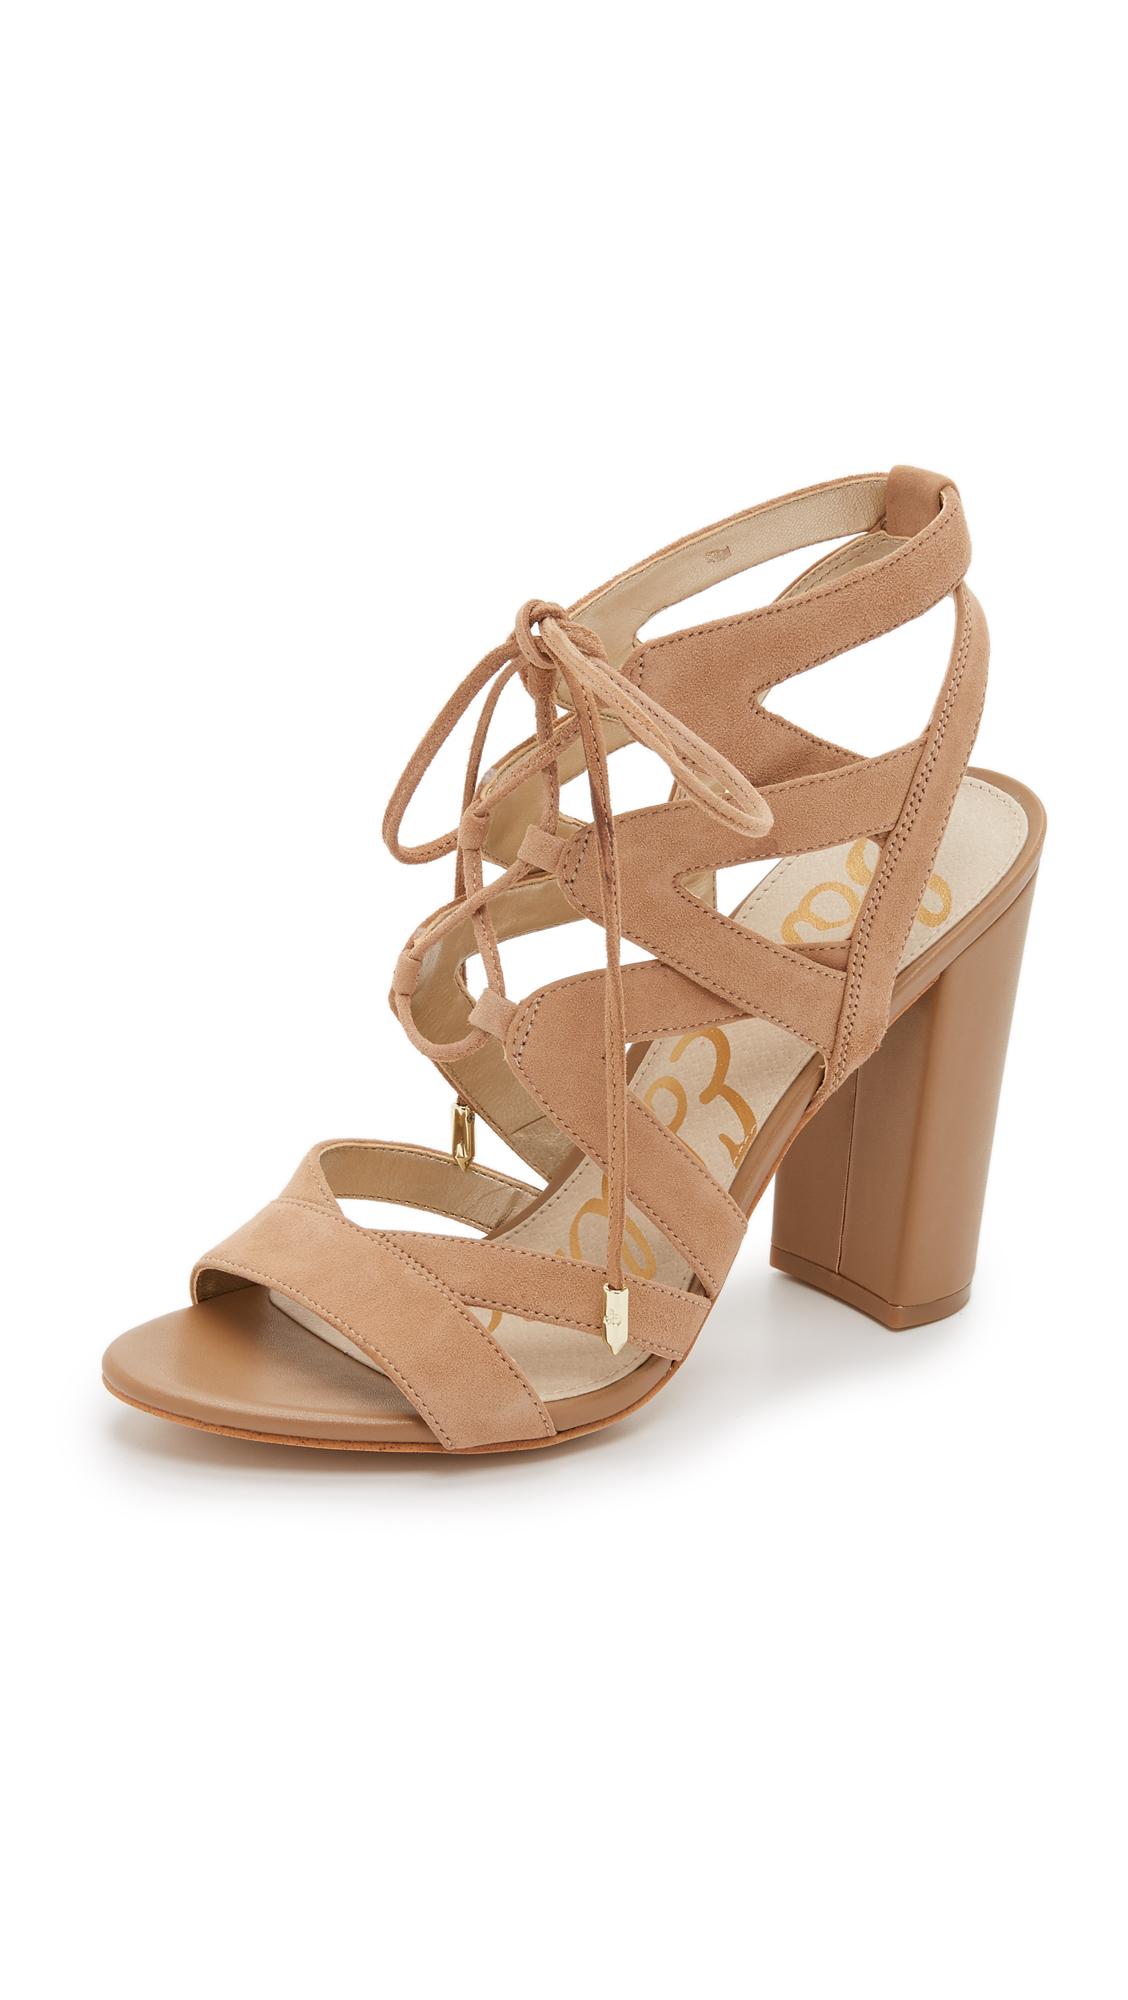 f1bd3fb599b9 Sam Edelman Yardley Lace Up Sandals on PopScreen